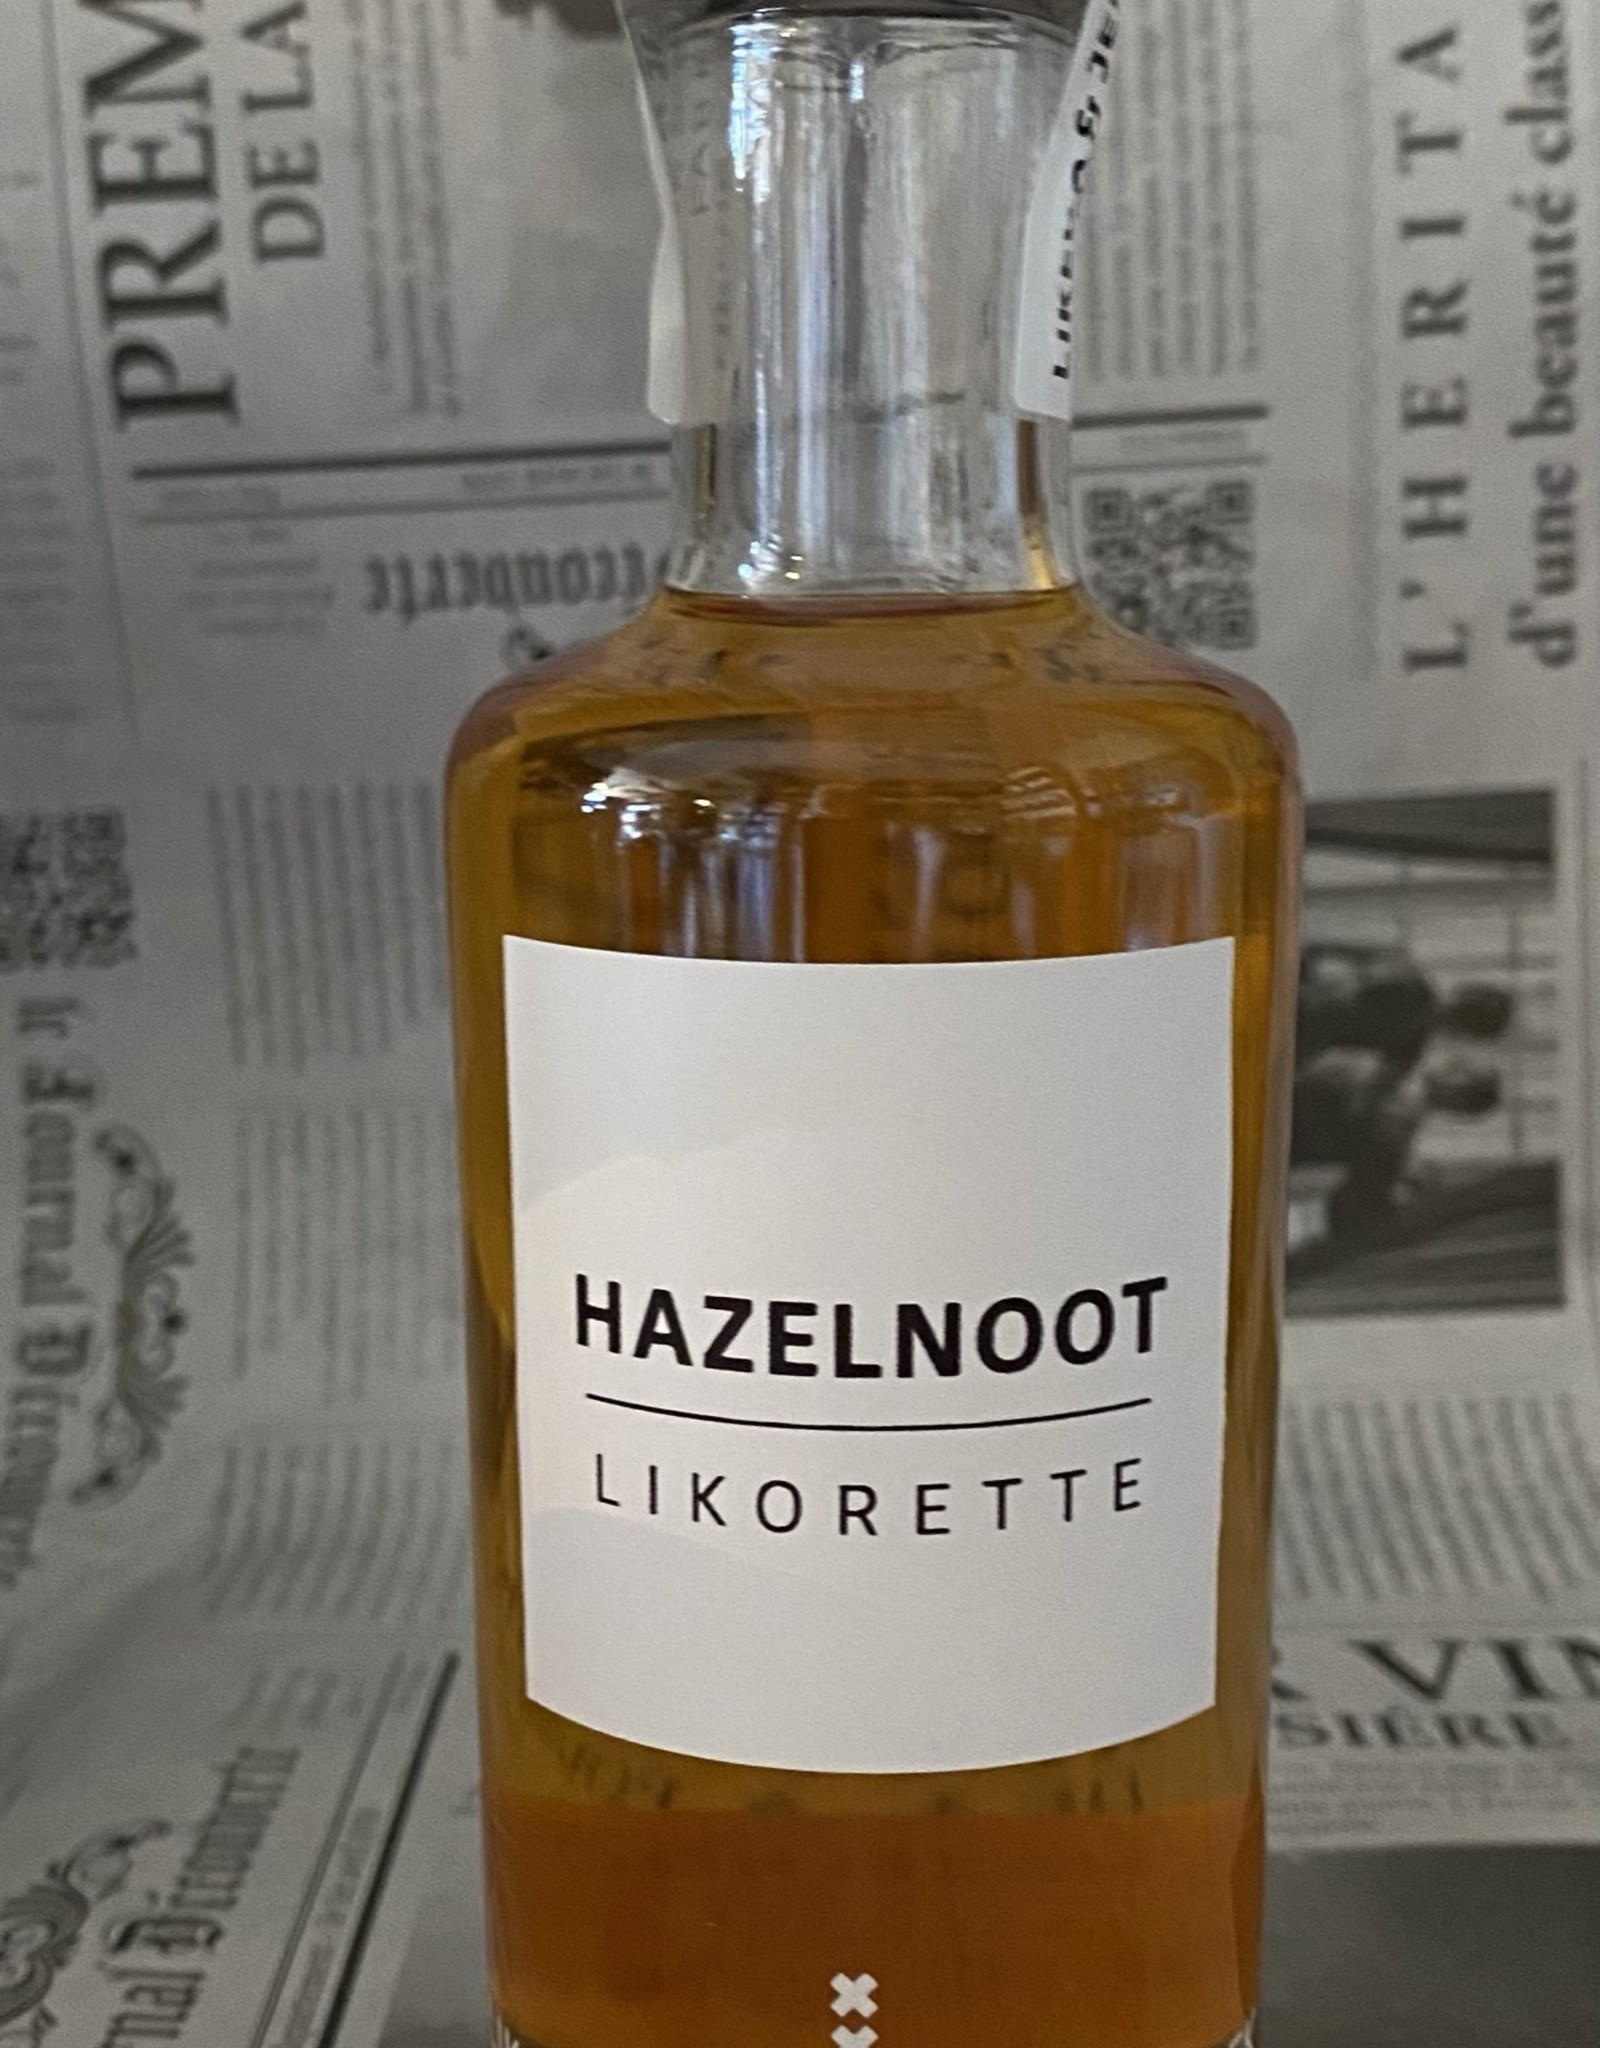 Likorette Hazelnoot